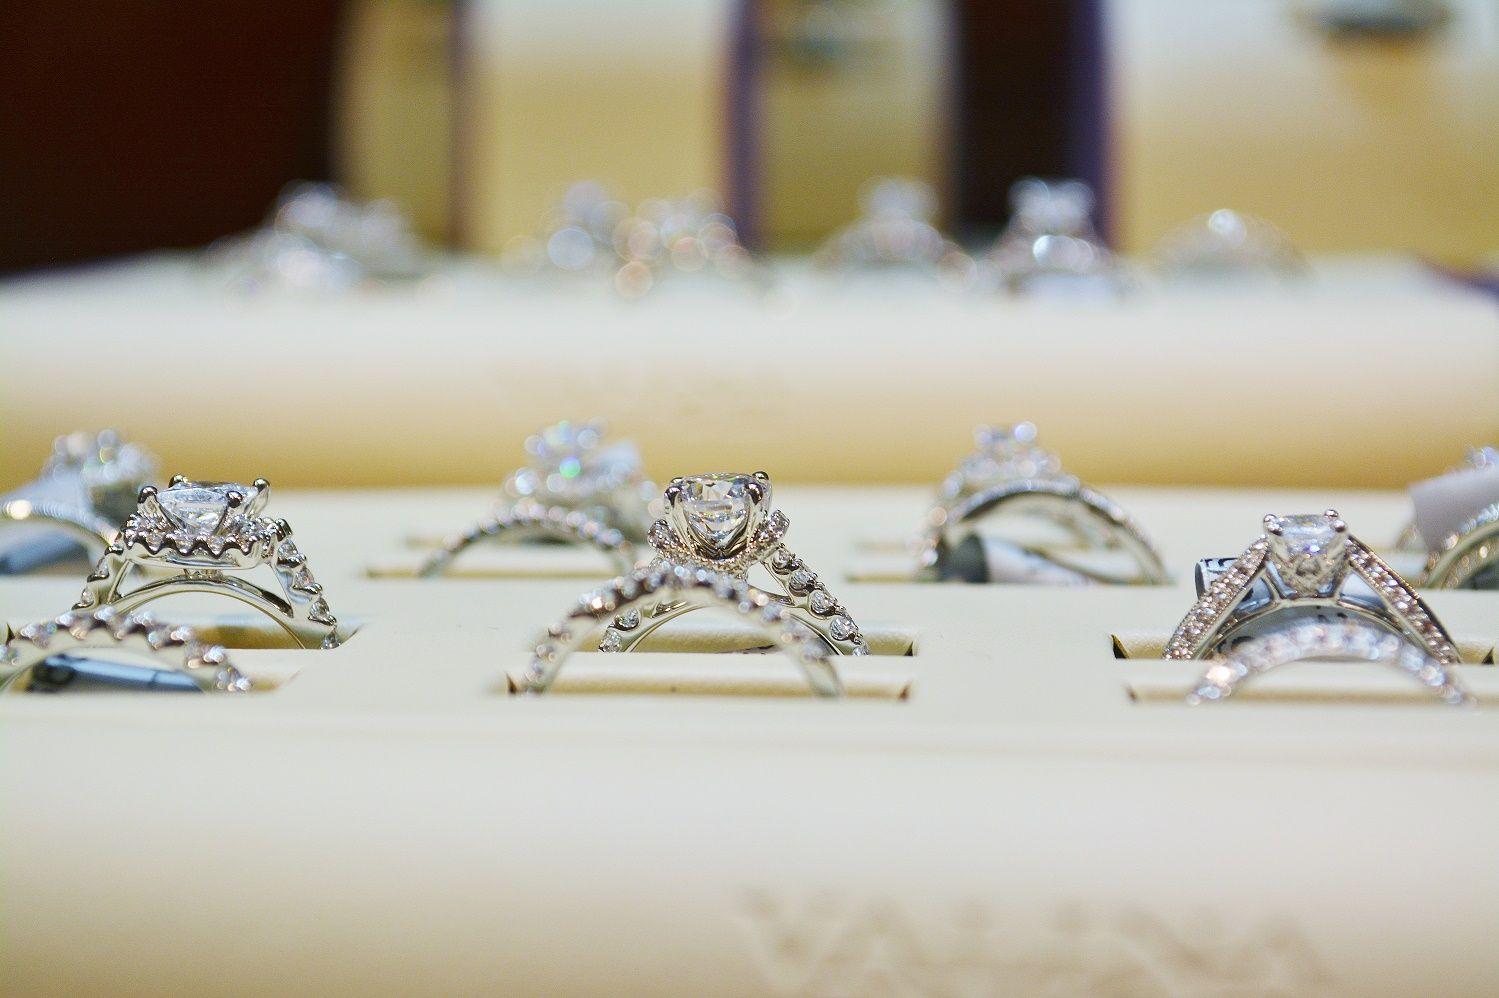 #WeddingRings #WeddingRing #BridalRings #BridalRing #Rings #DiamondRings #DiamondRing